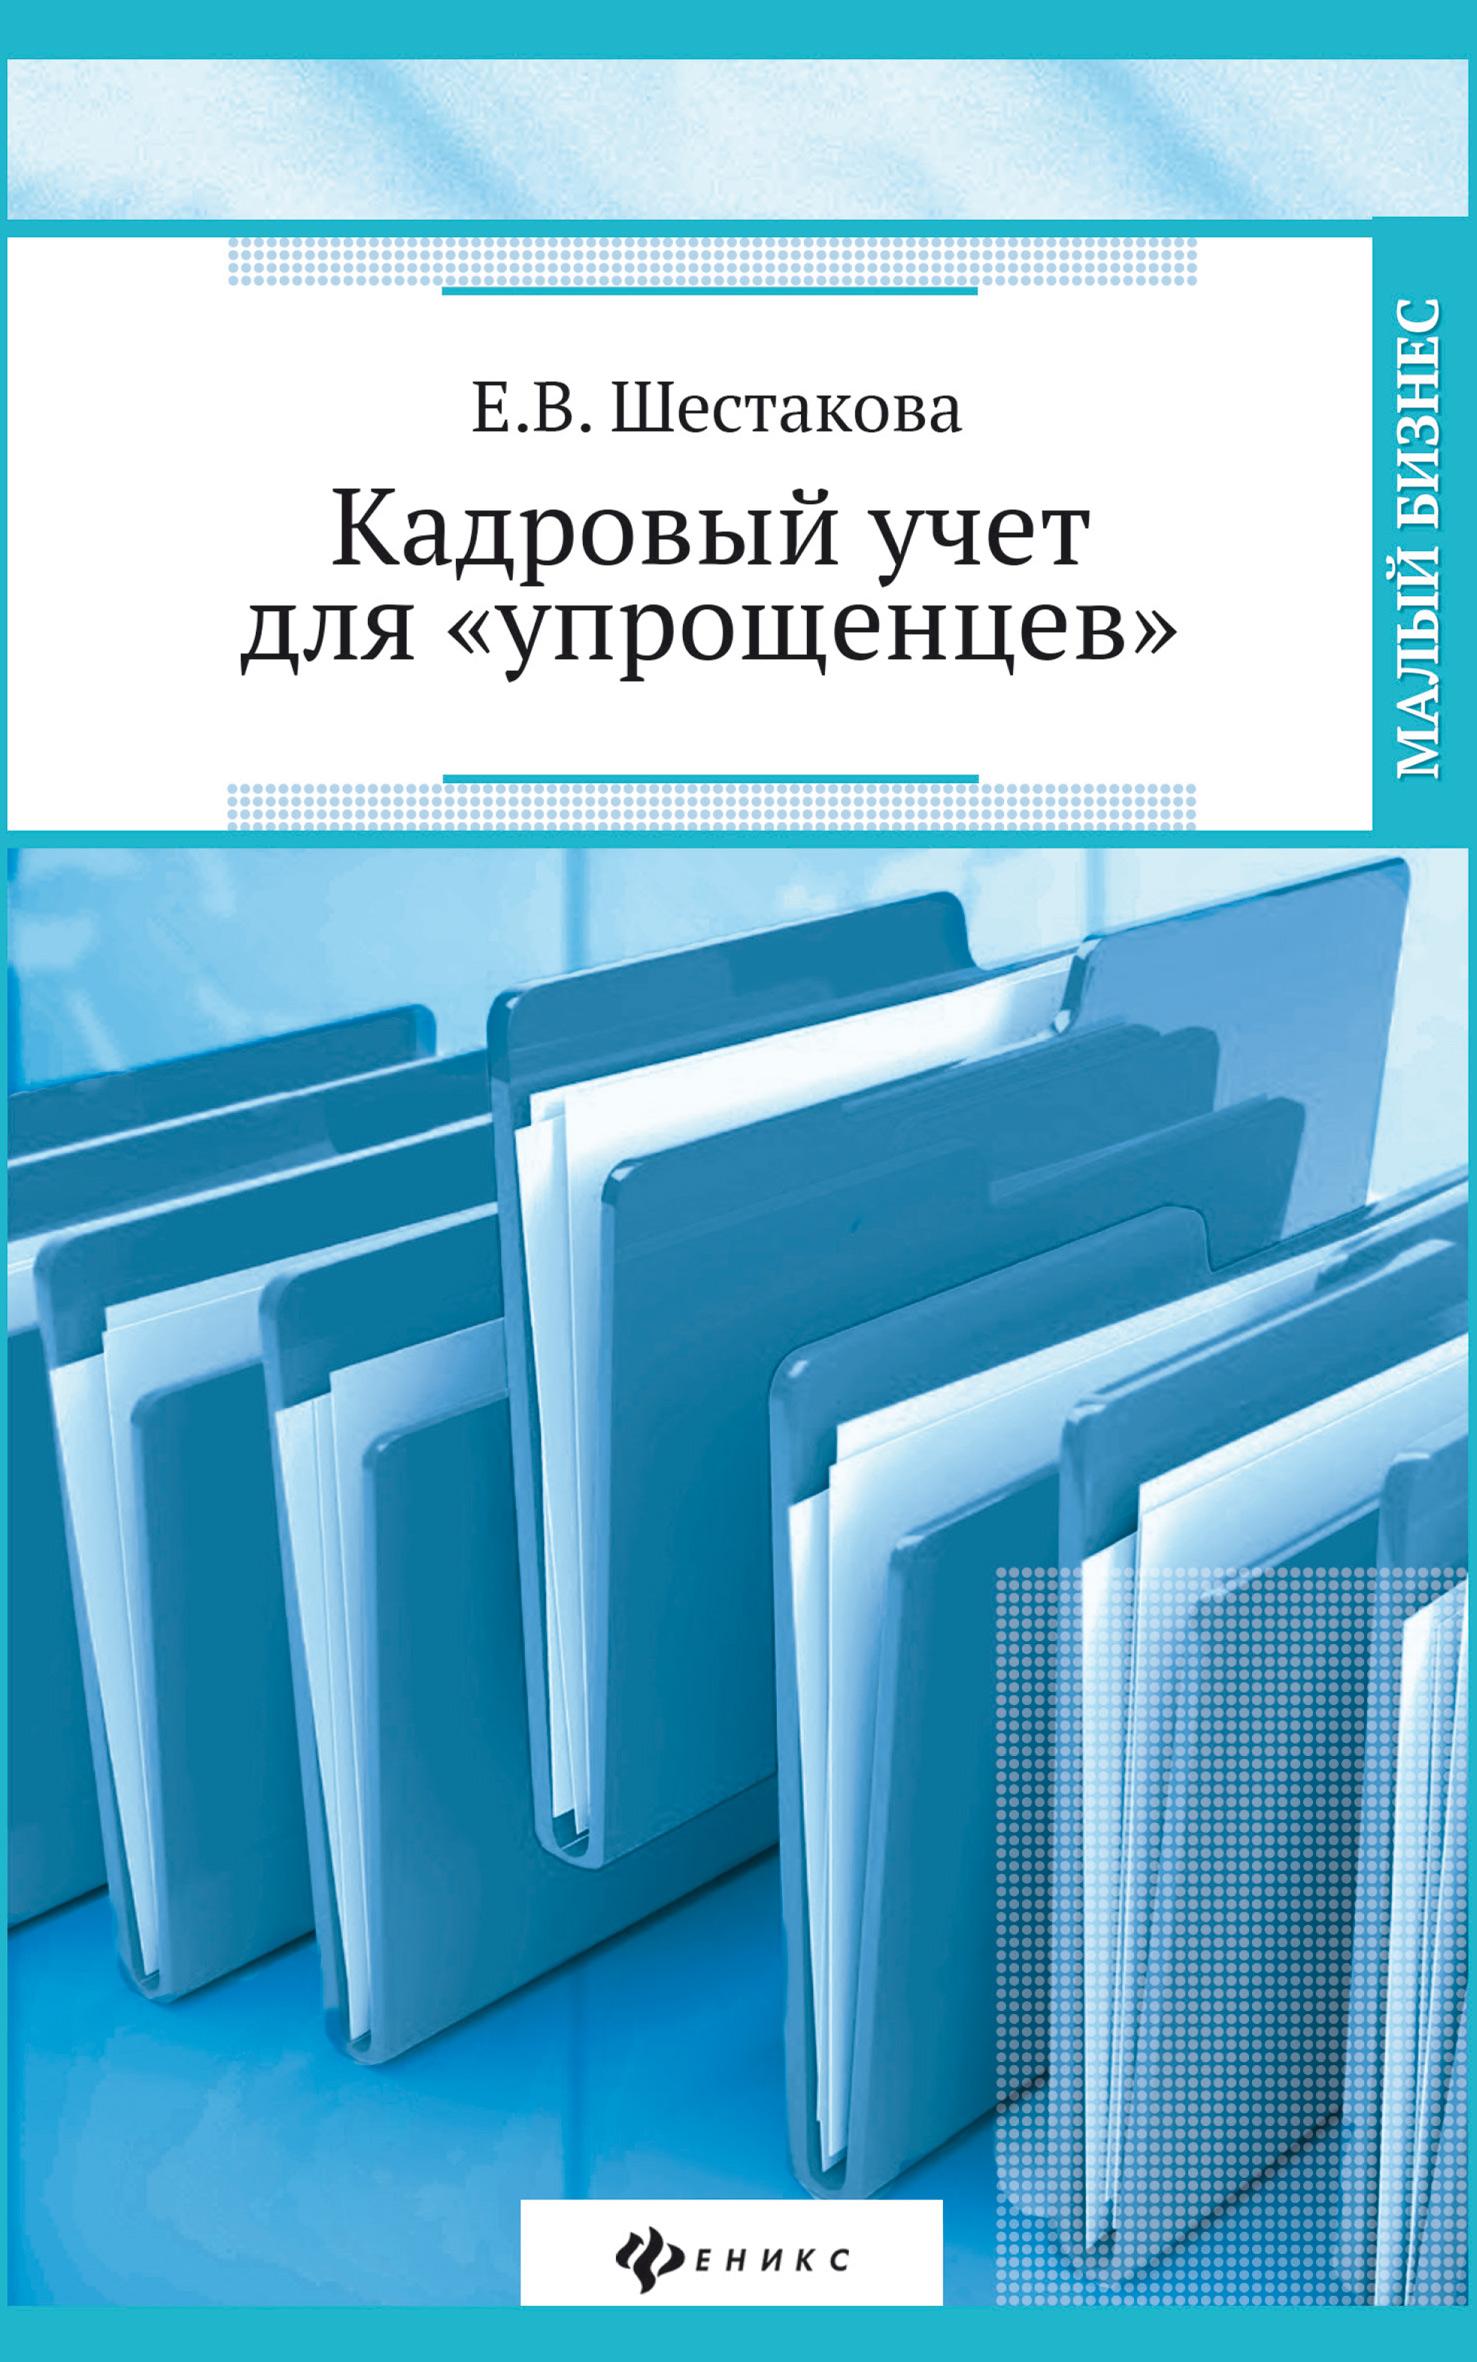 Обложка книги. Автор - Екатерина Шестакова